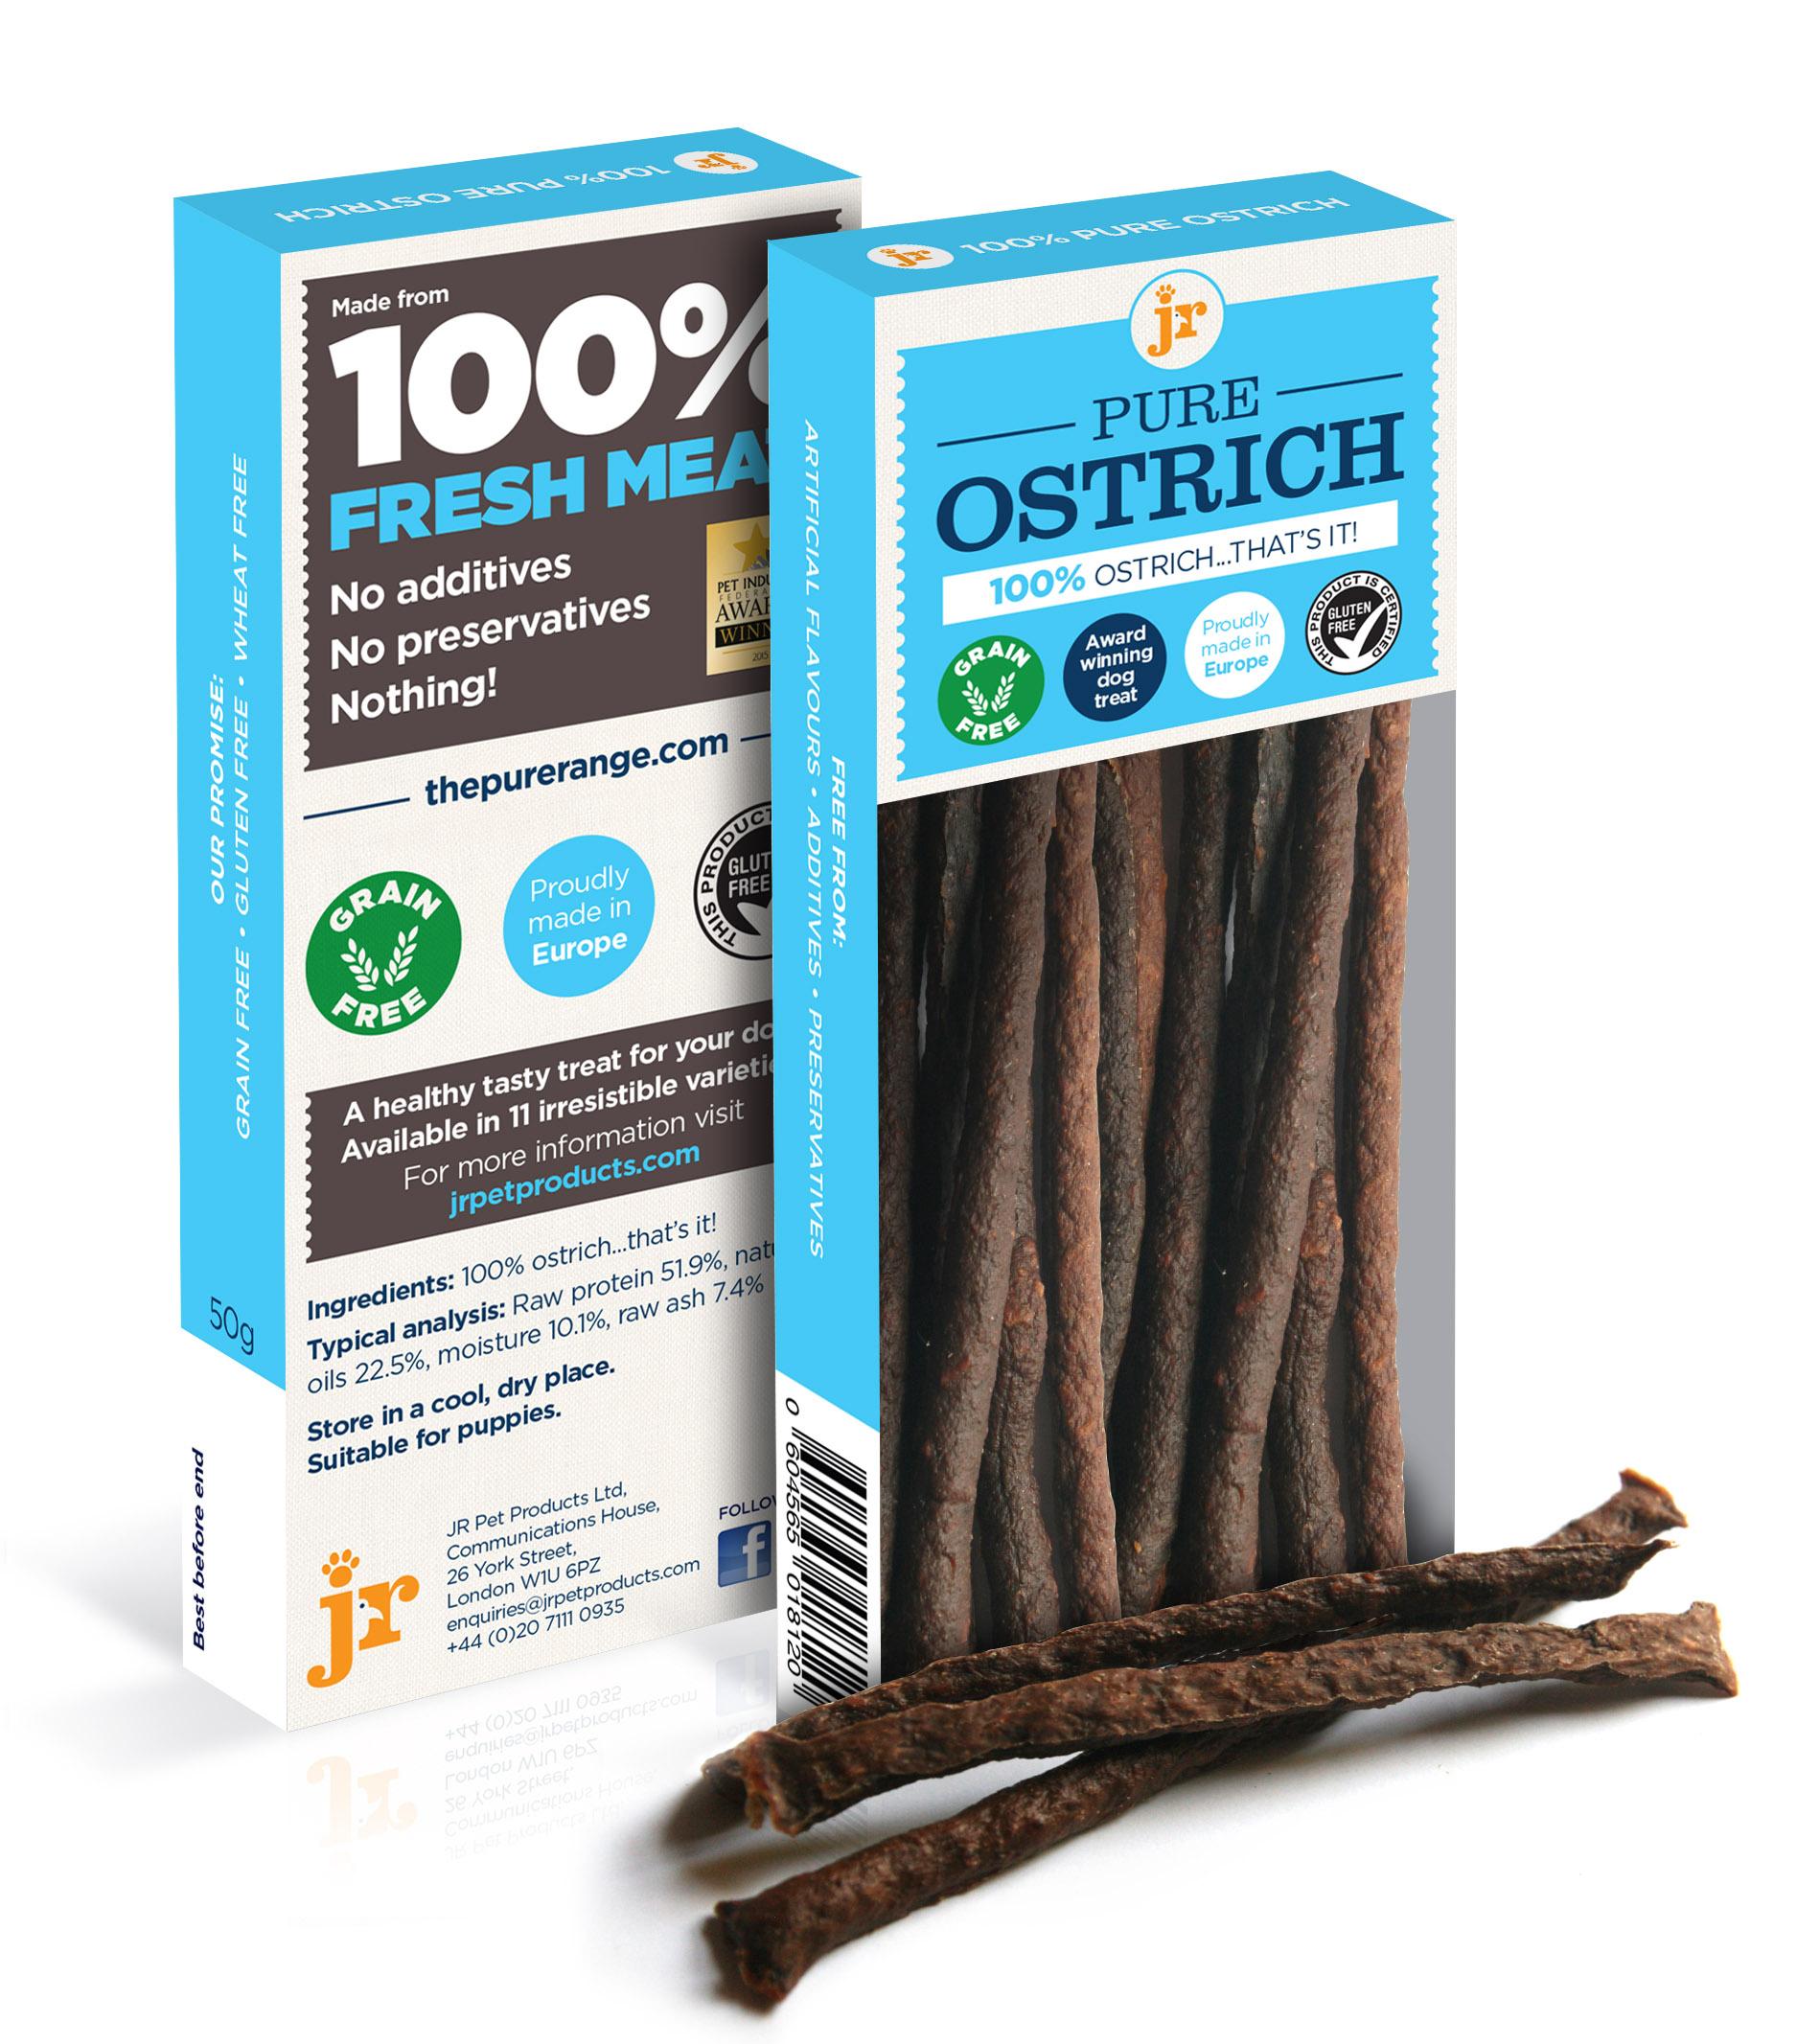 Ostrich-box.jpg